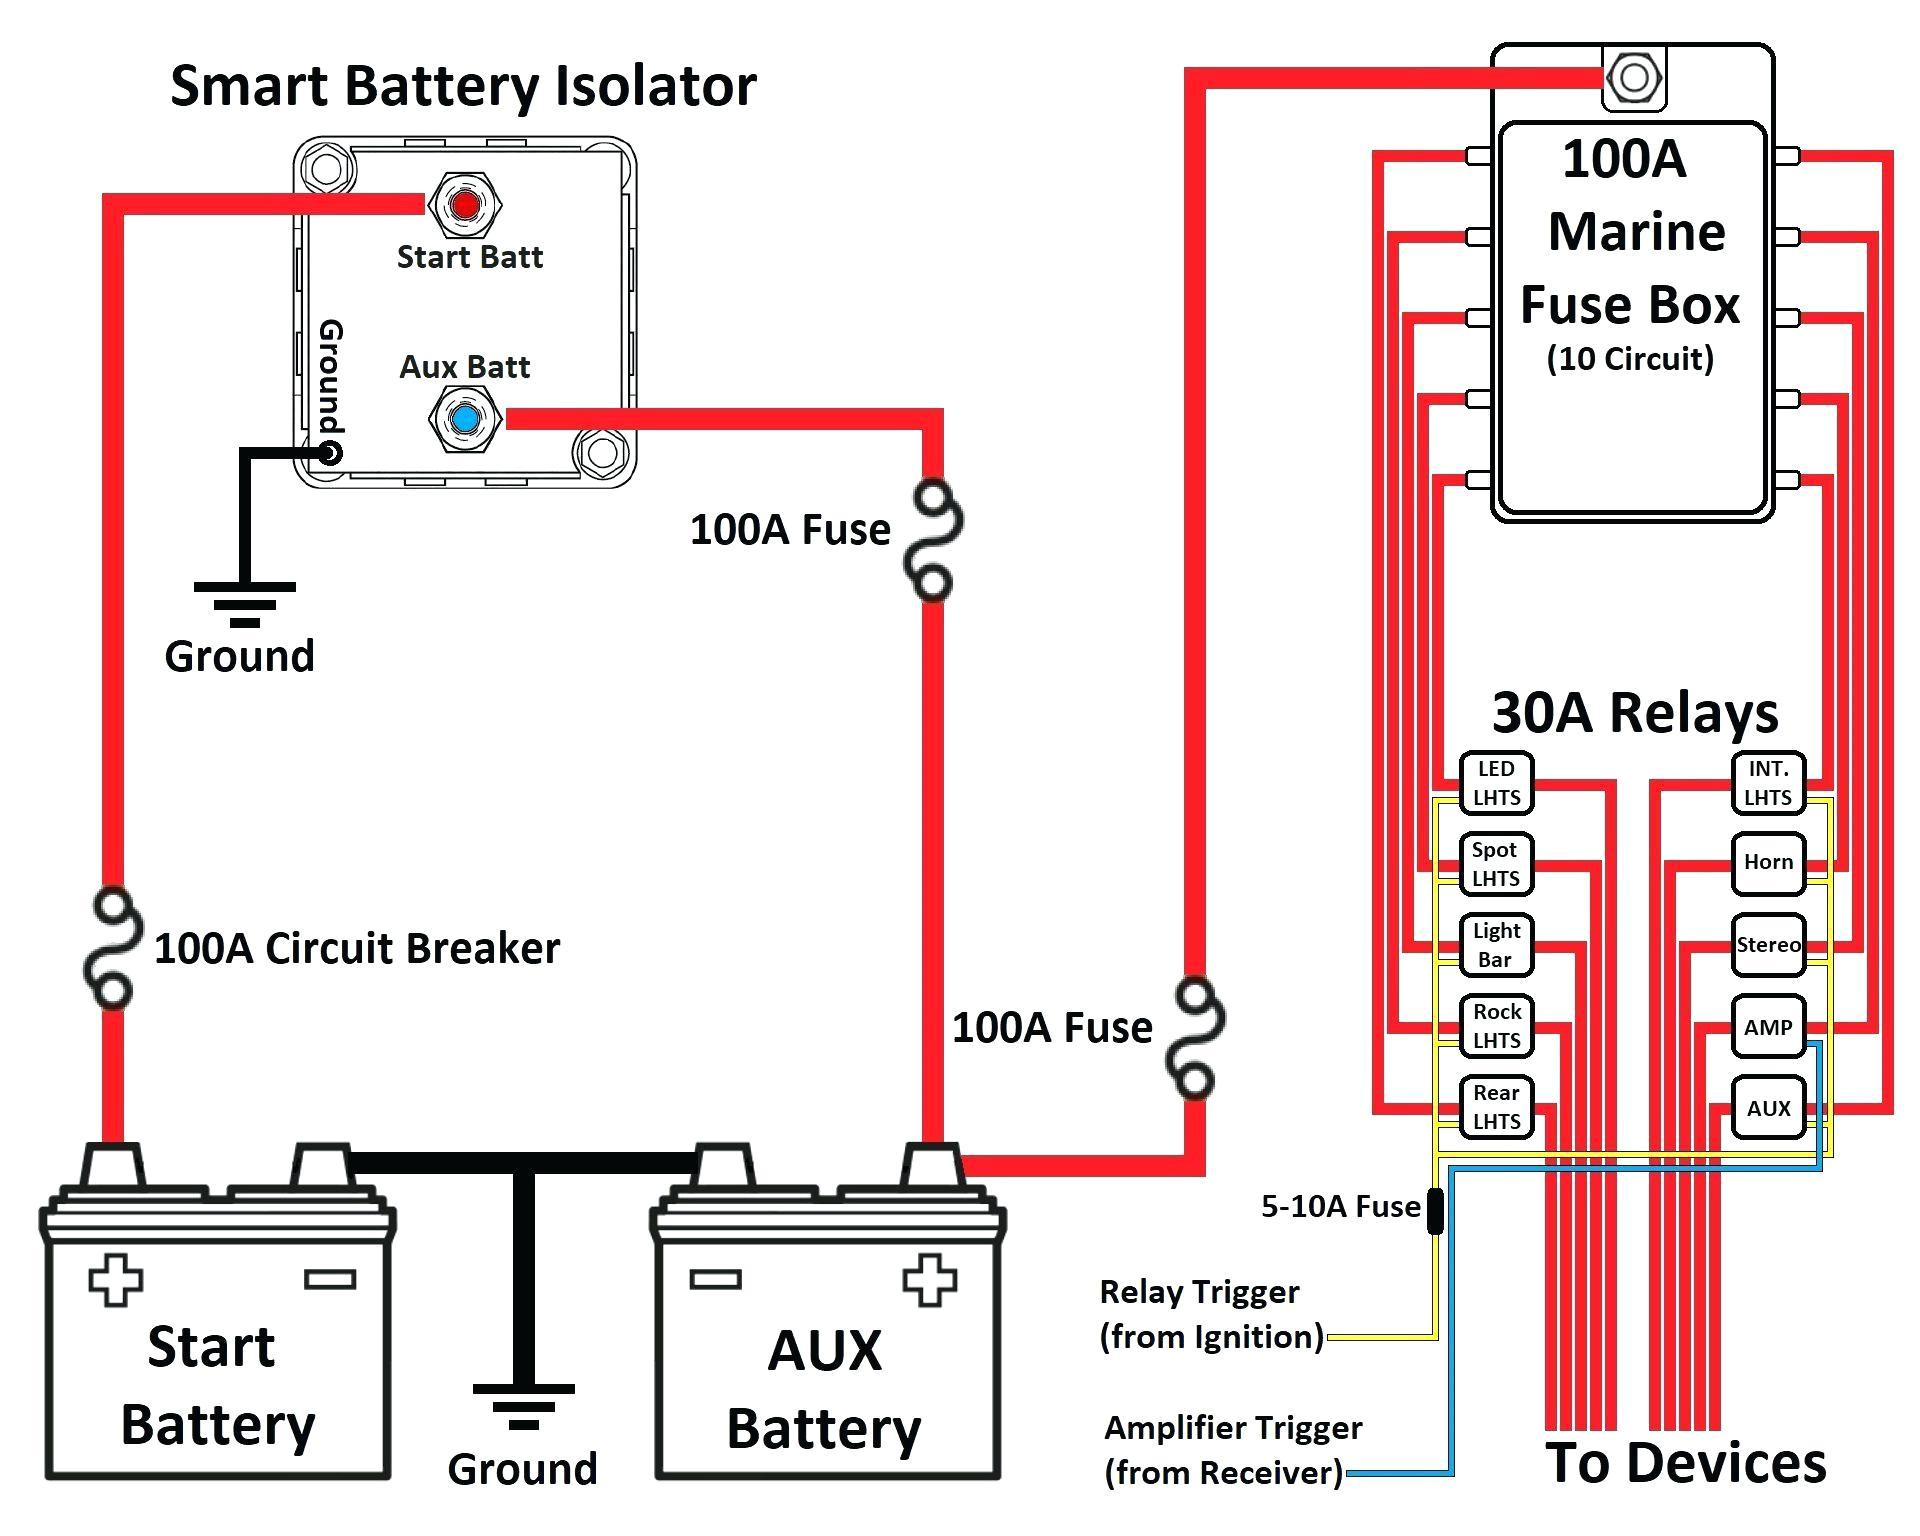 12v battery wiring diagram wiring diagram show club car 12v battery wiring diagram 12v battery wiring